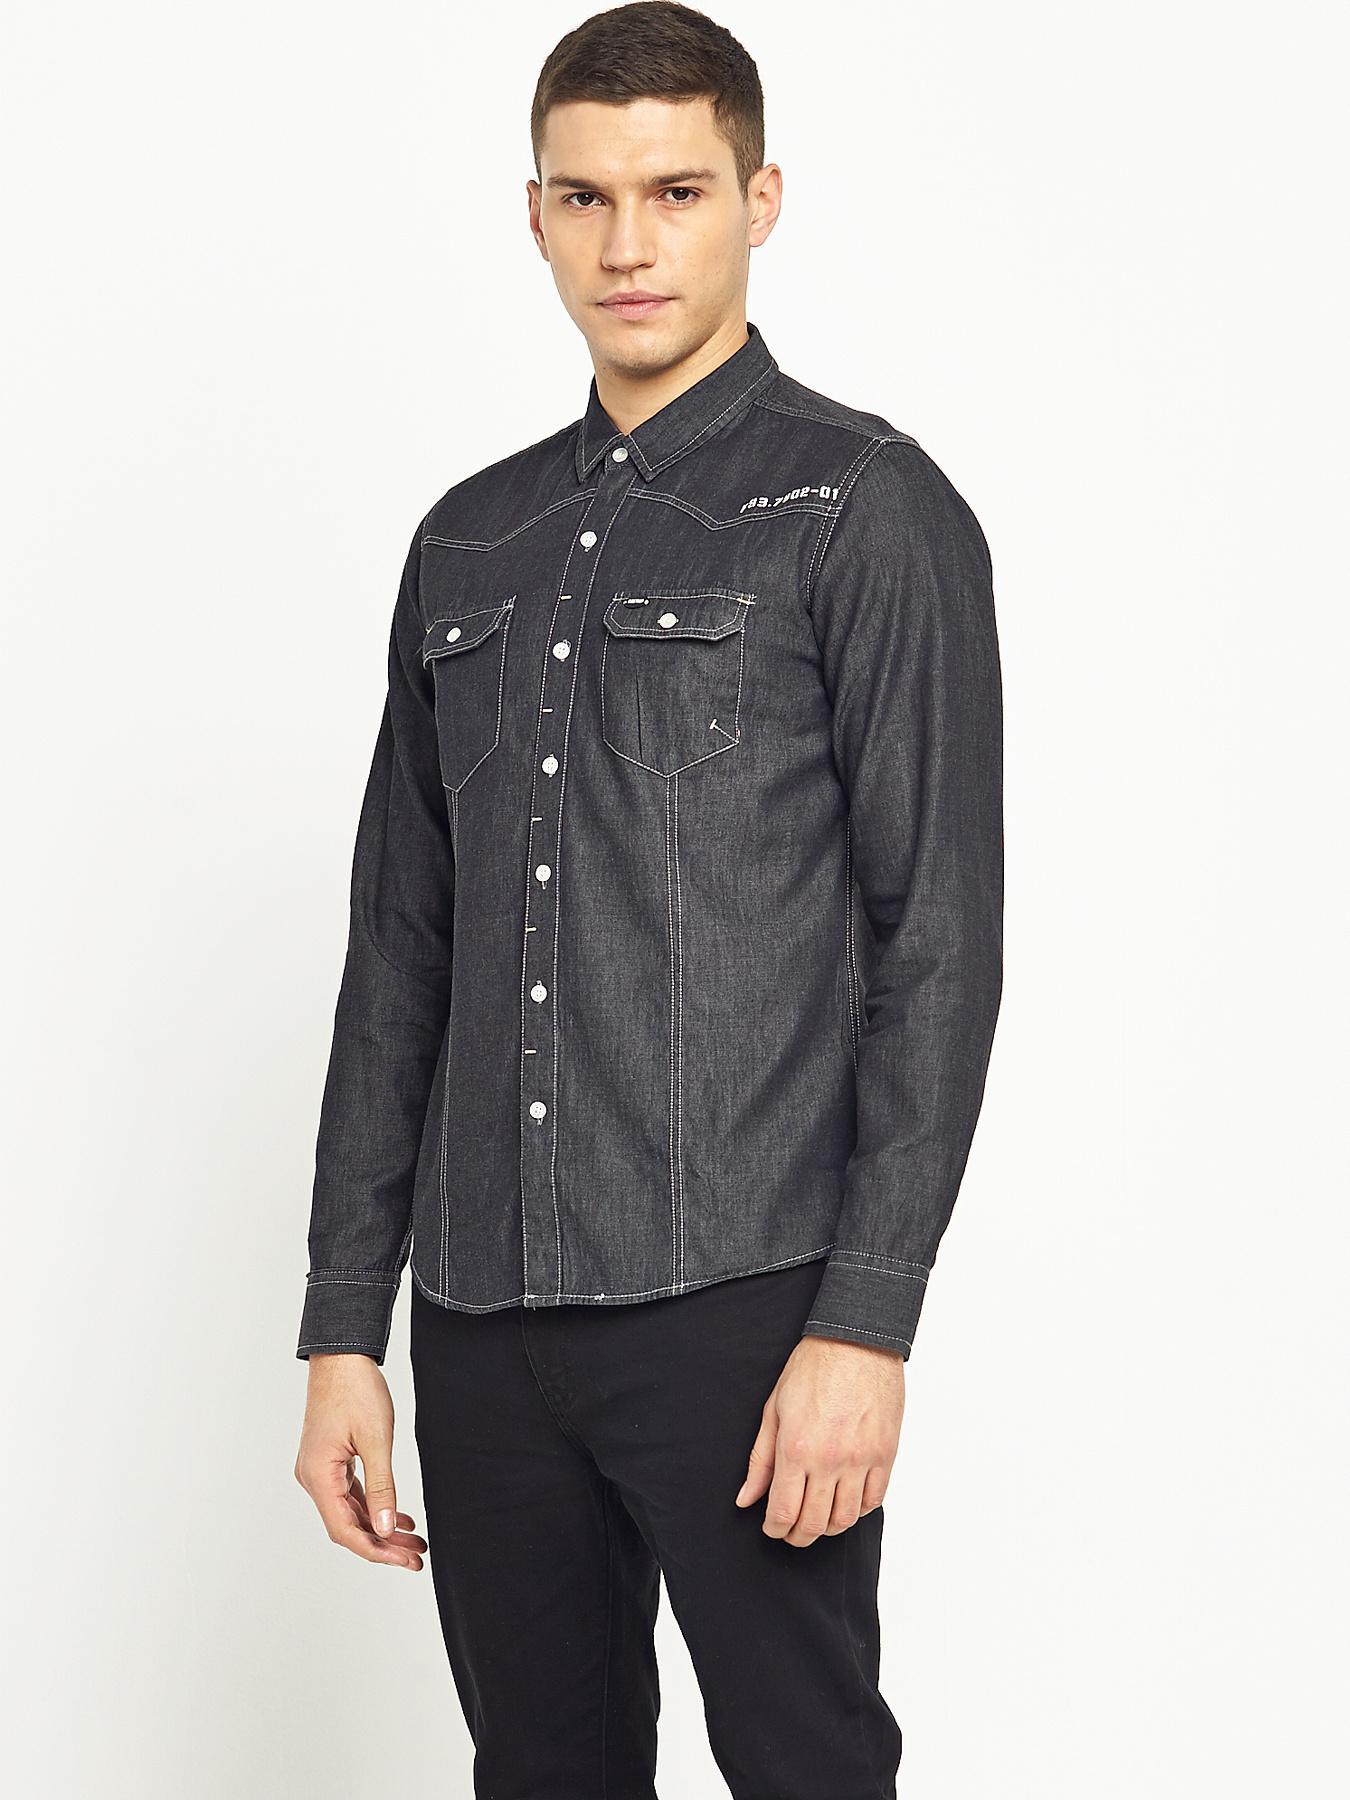 Firetrap Mens Garrick Long Sleeved Shirt - Black, Black